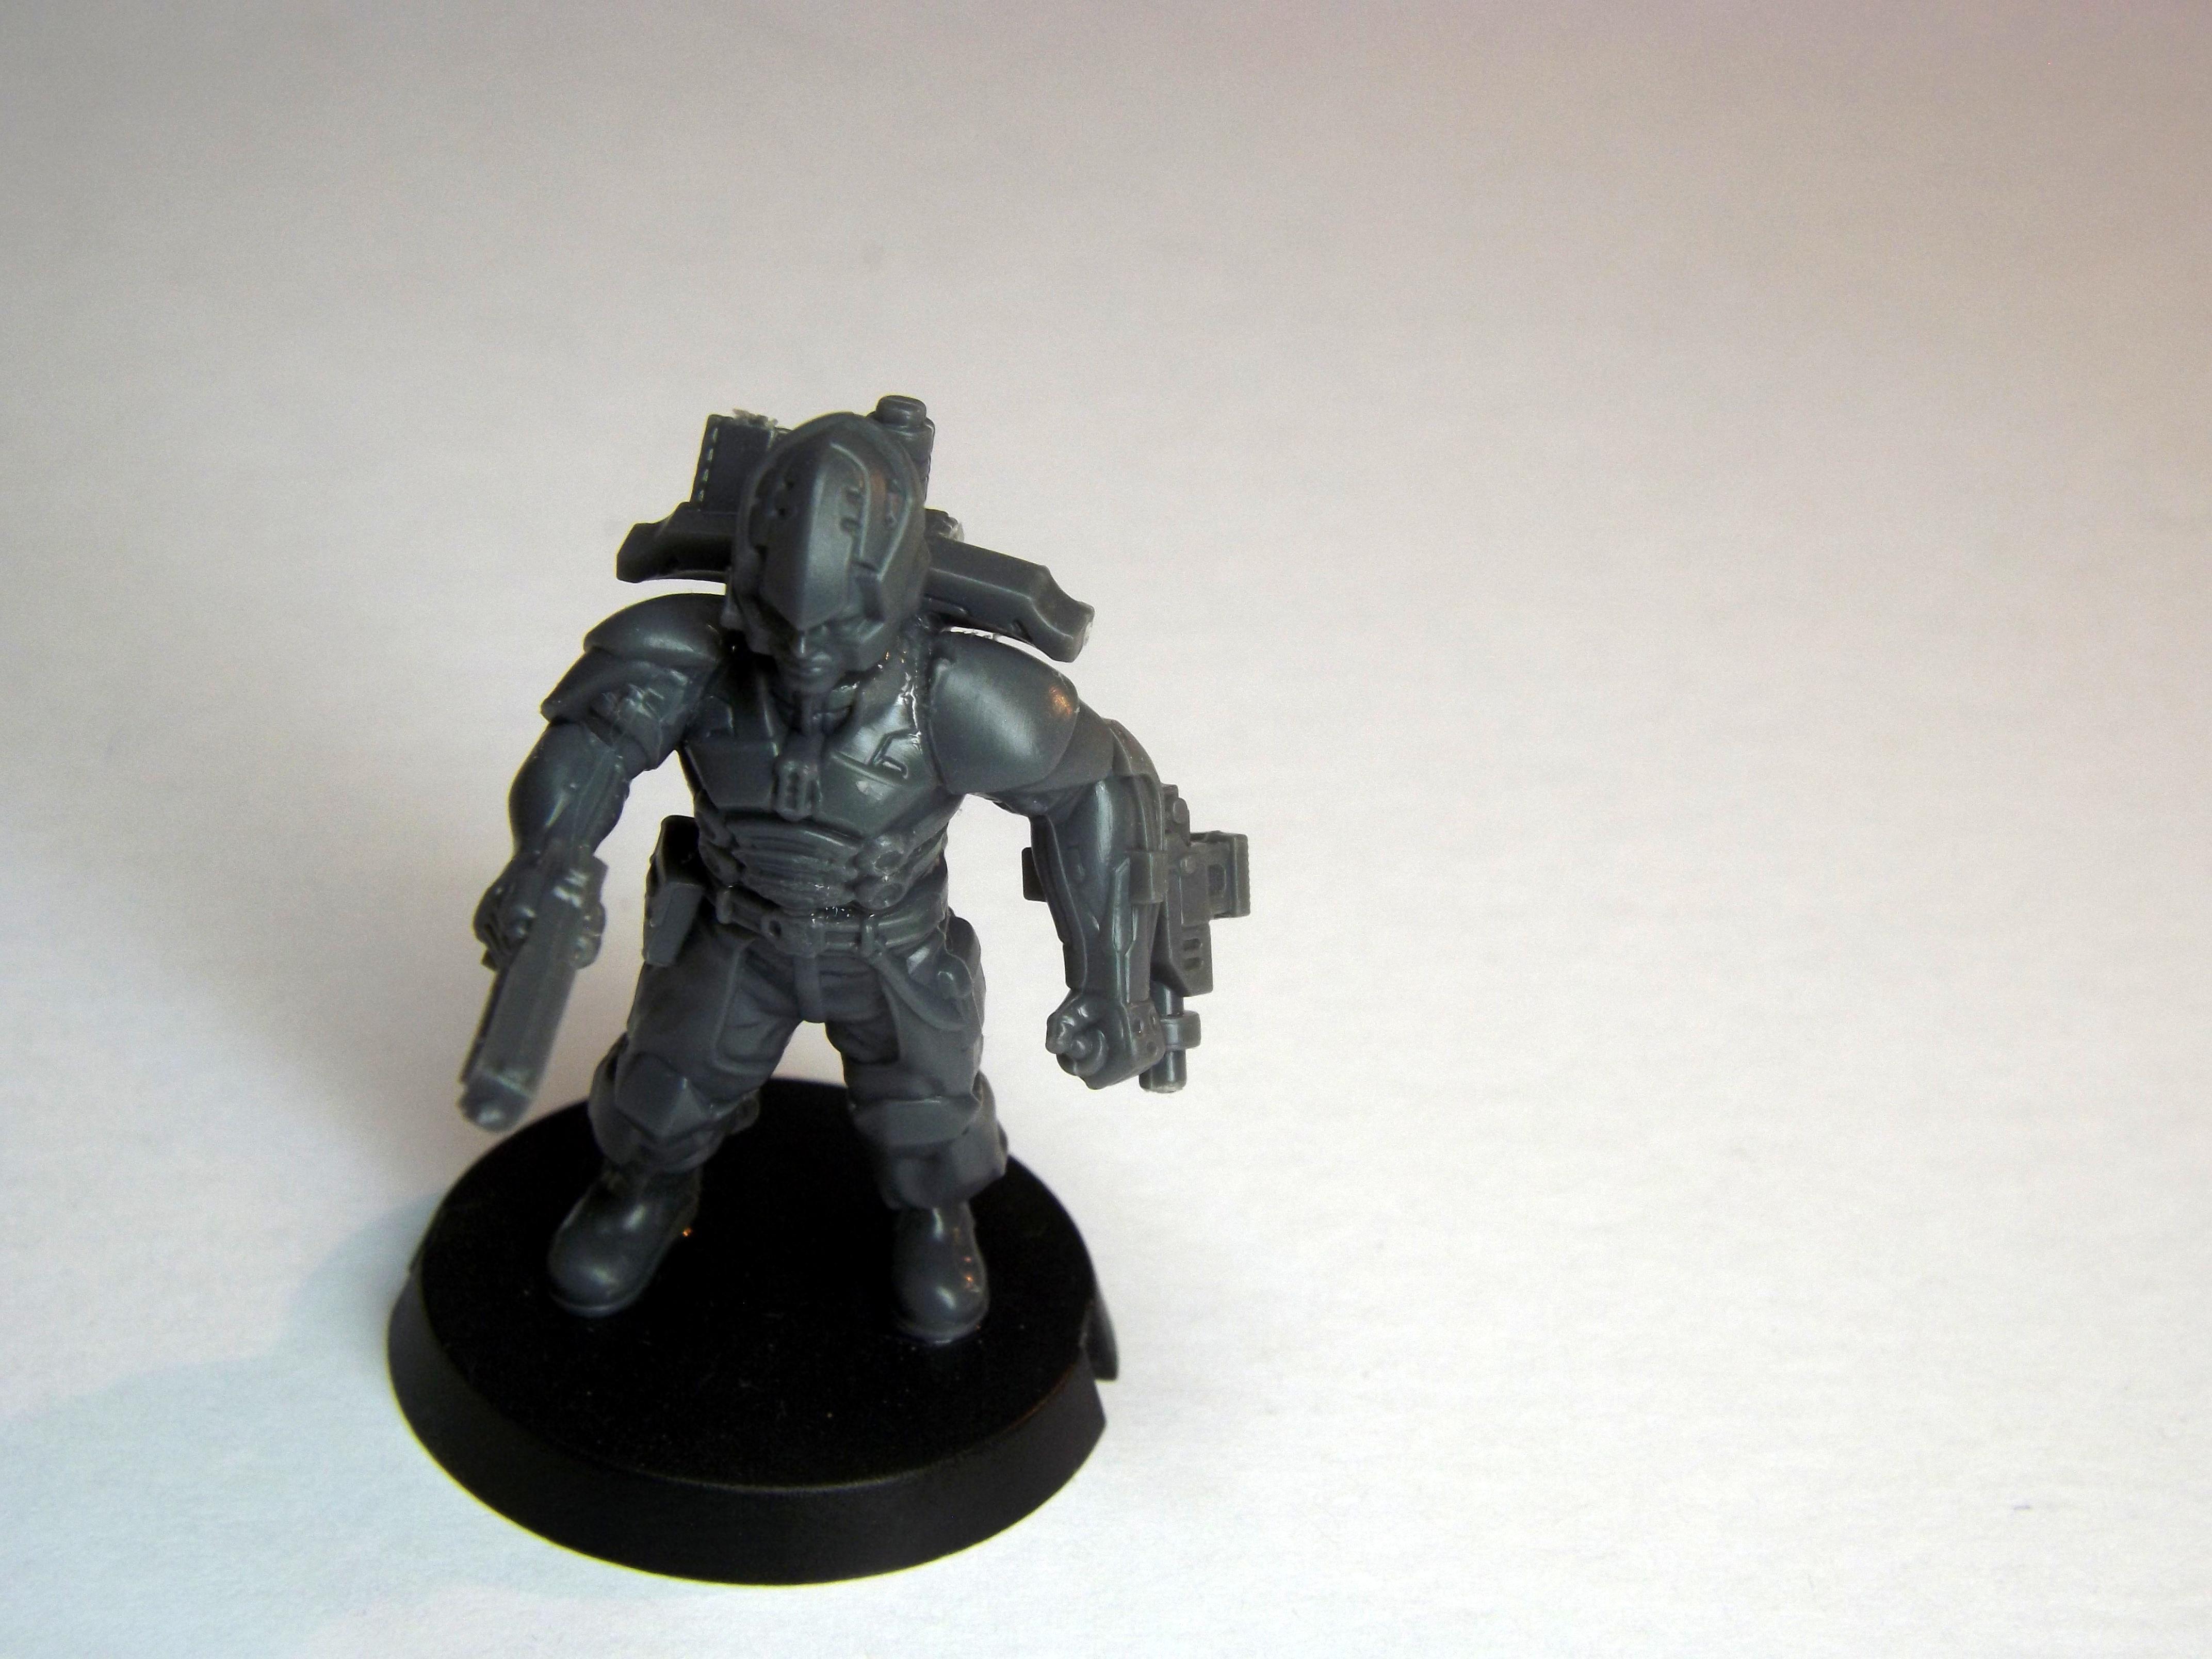 Bot, Conversion, Handler, Journeyman, Maelstrom's Edge, Medge